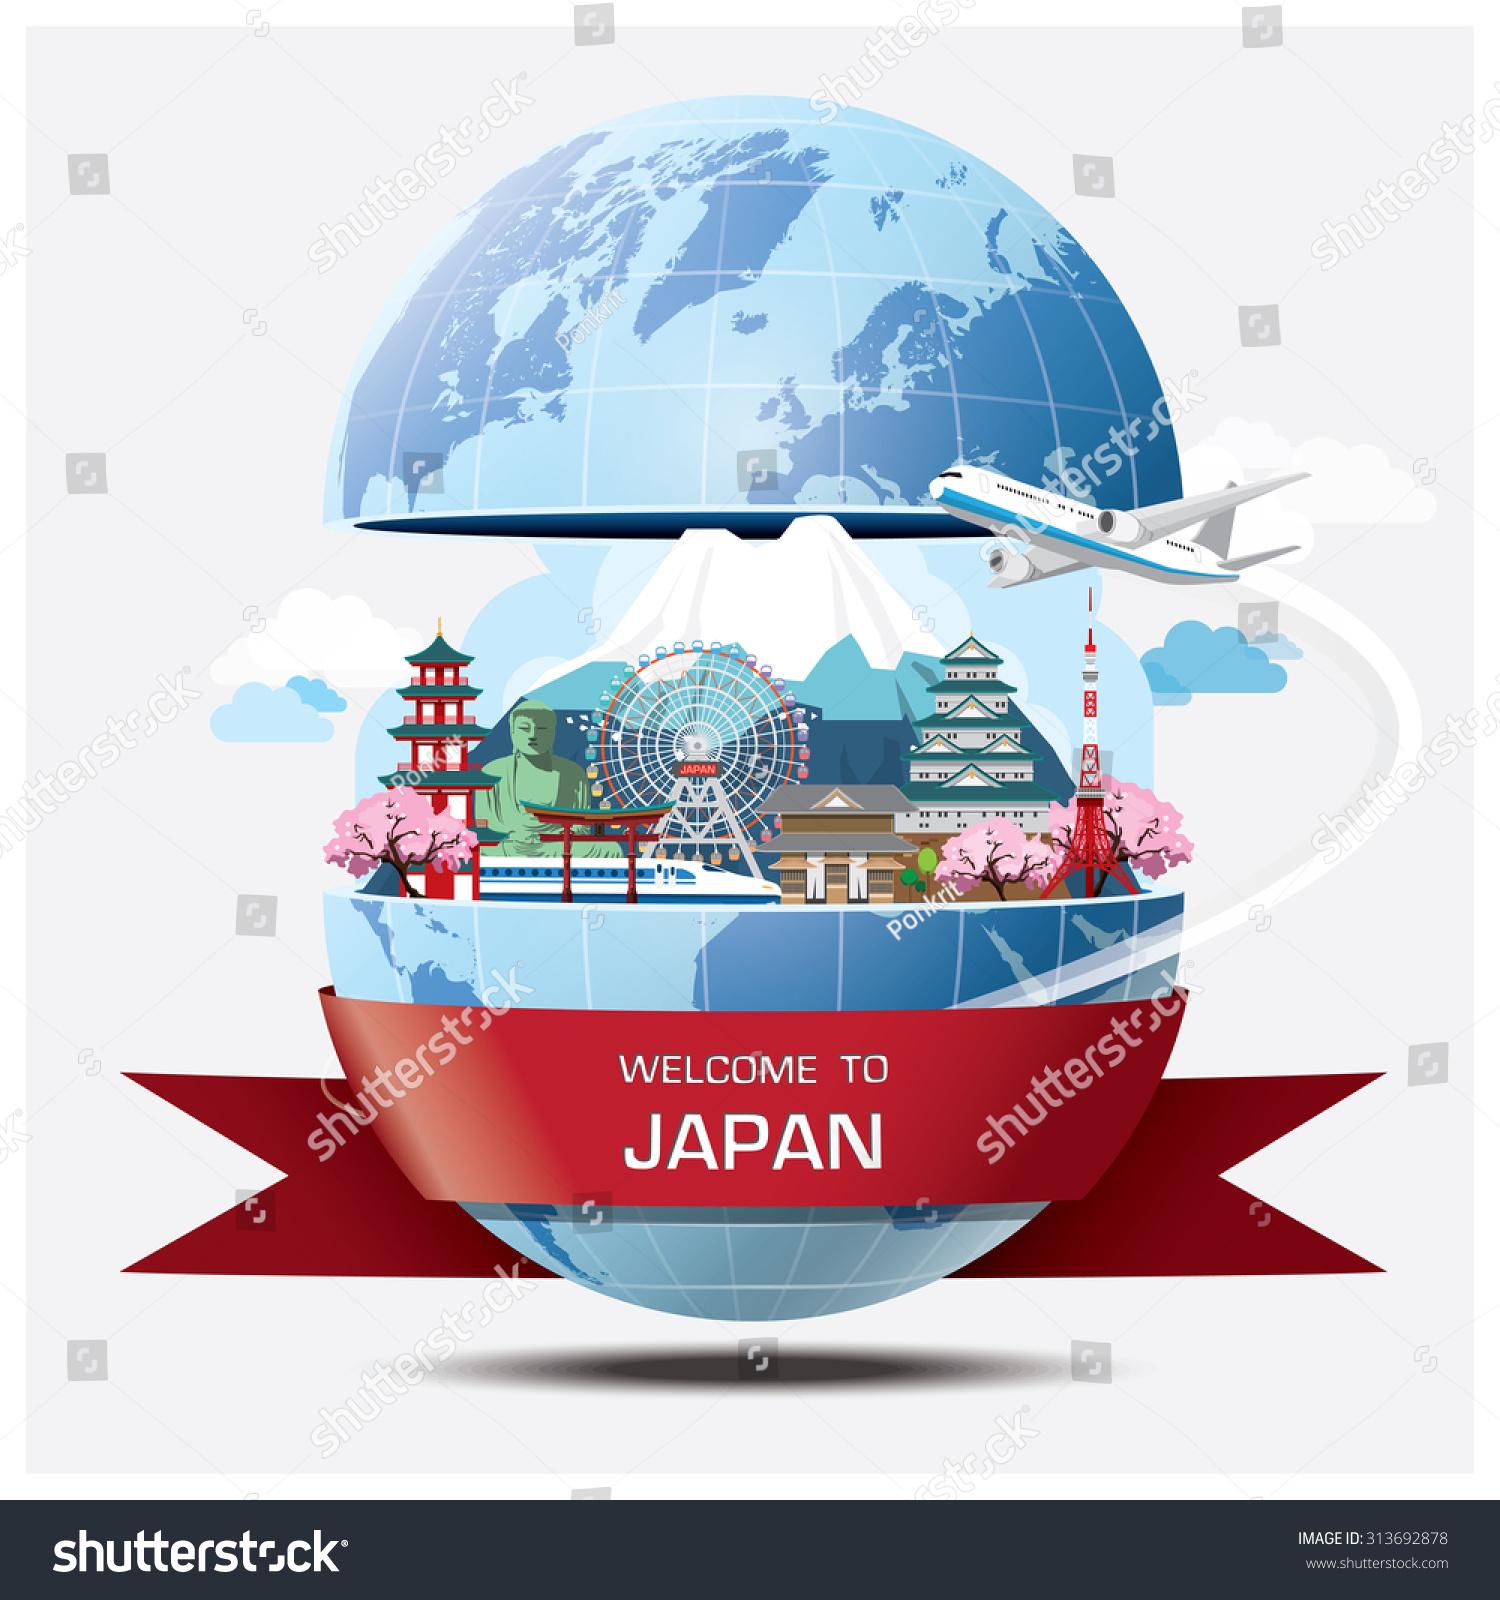 japan travel brochure template - japan landmark global travel journey infographic stock